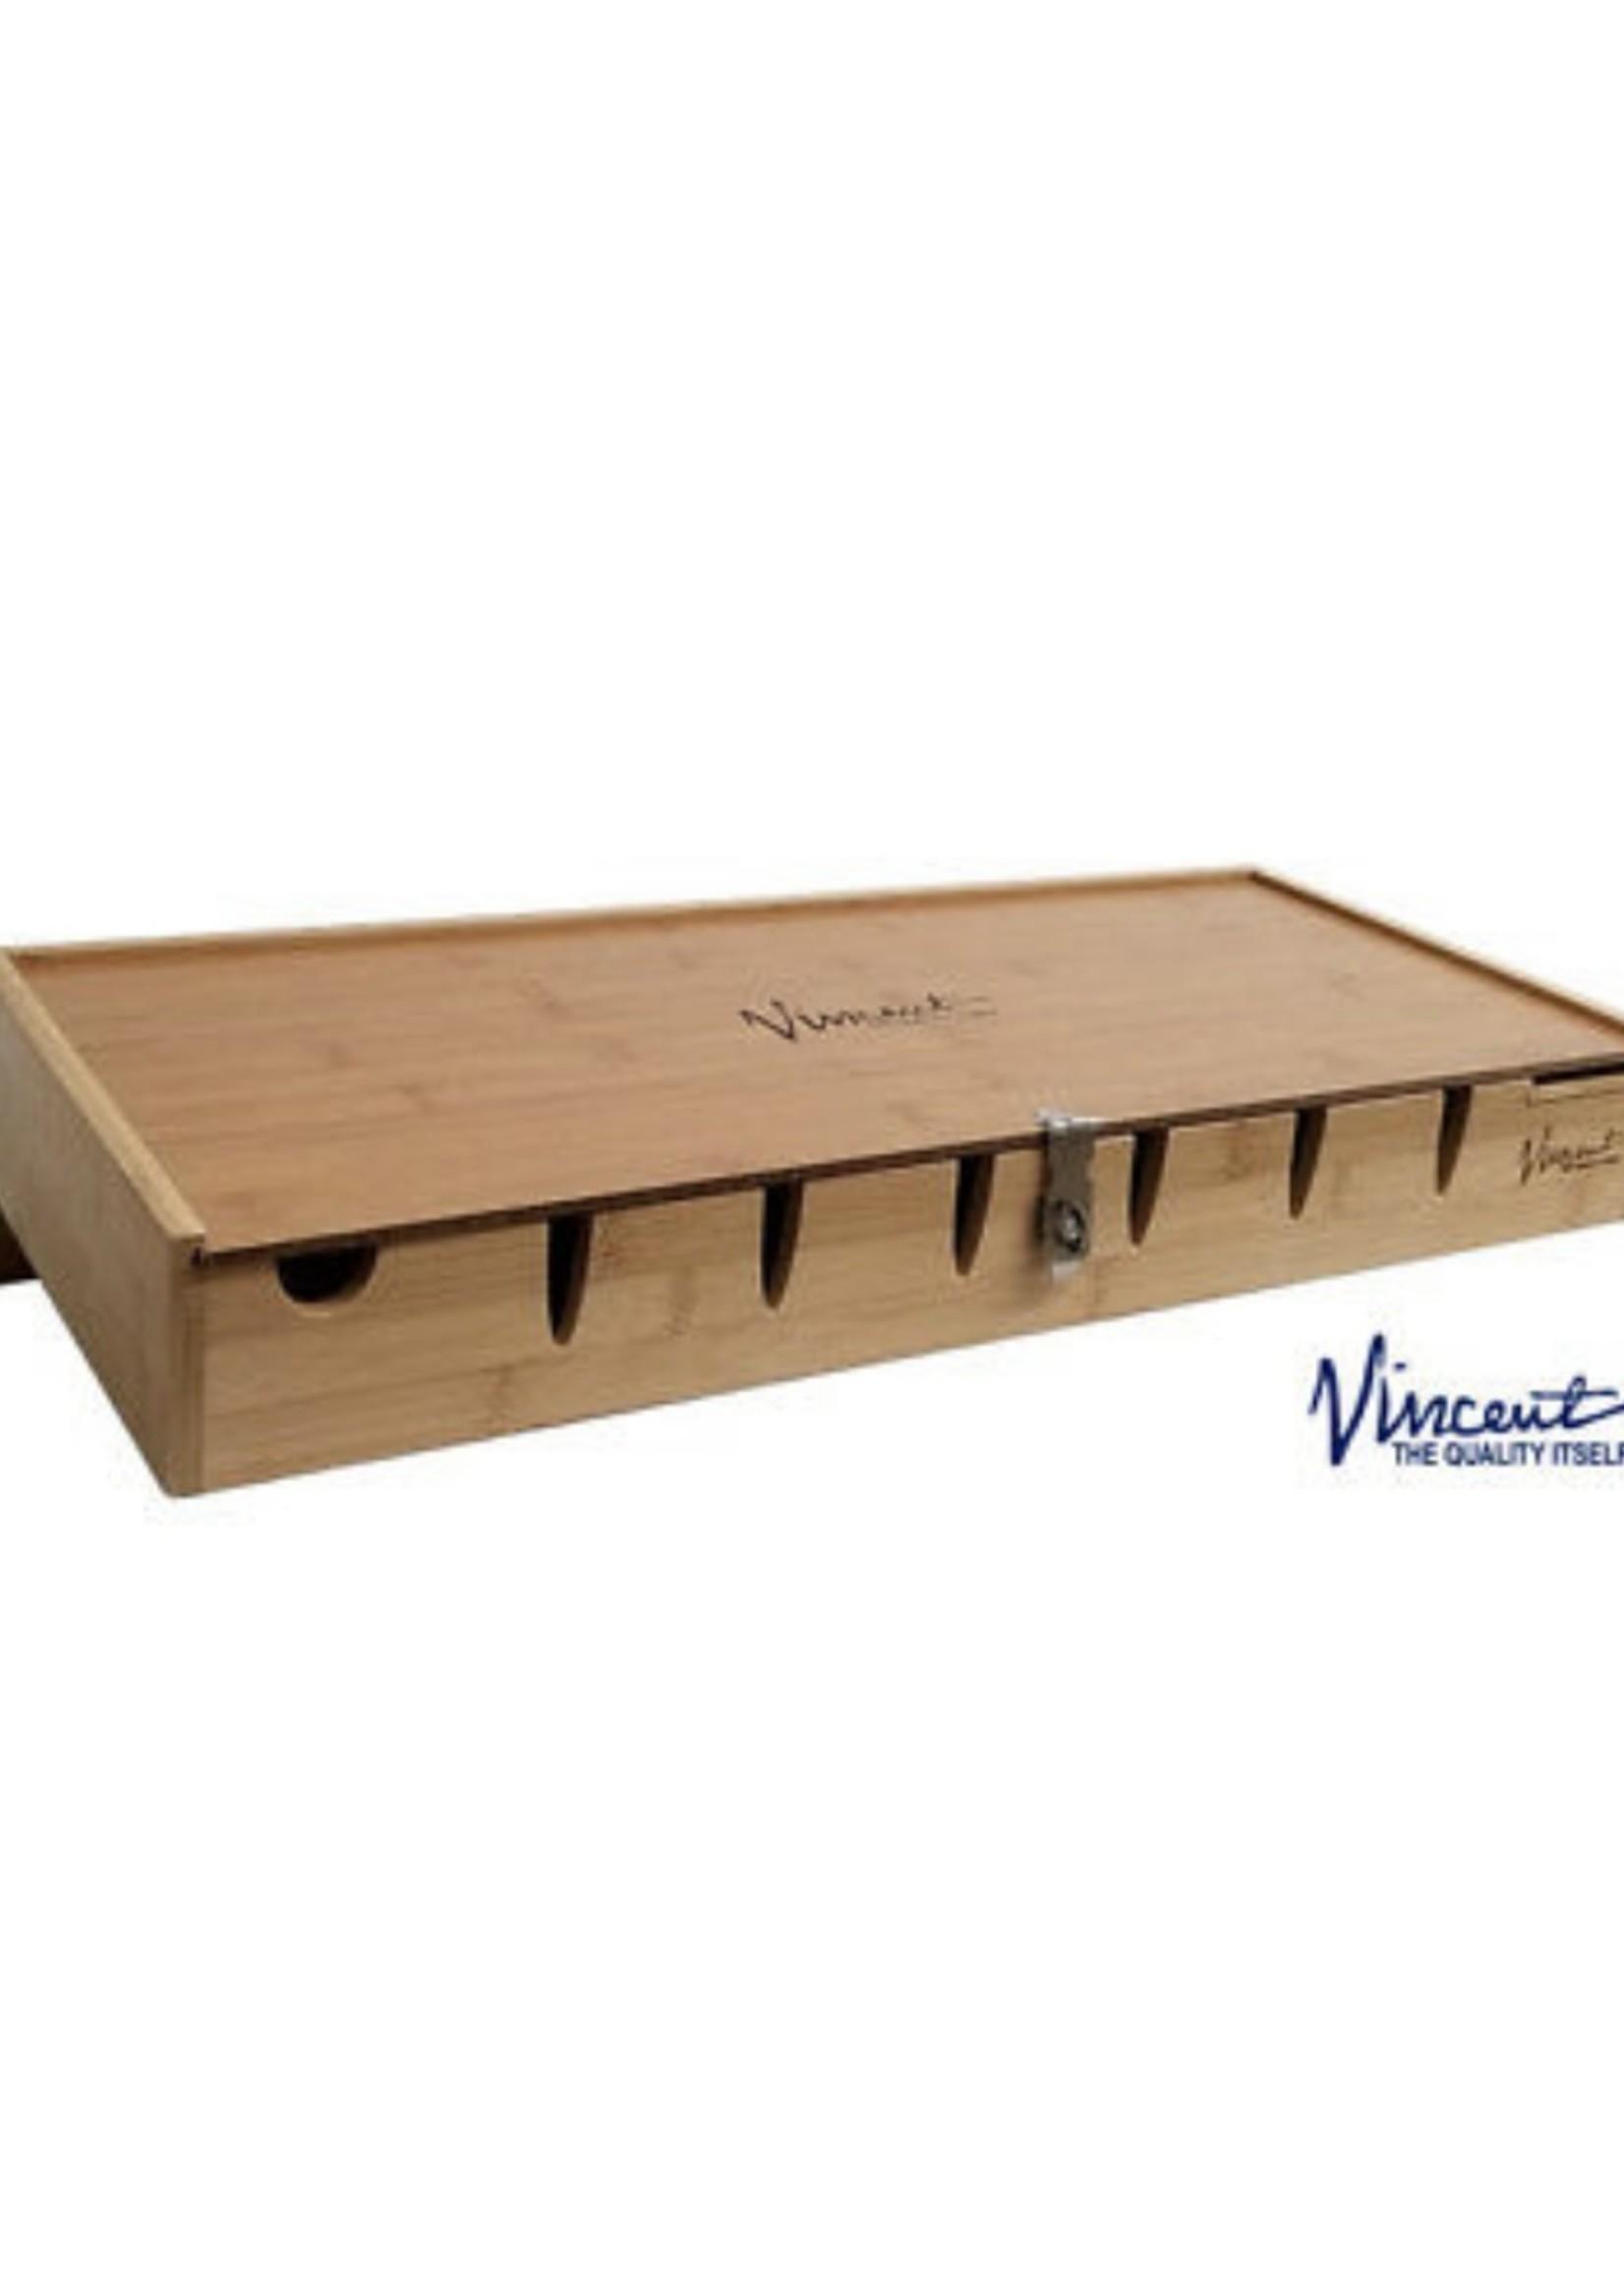 Vincent Vincent Countertop Tray- Natural Wood